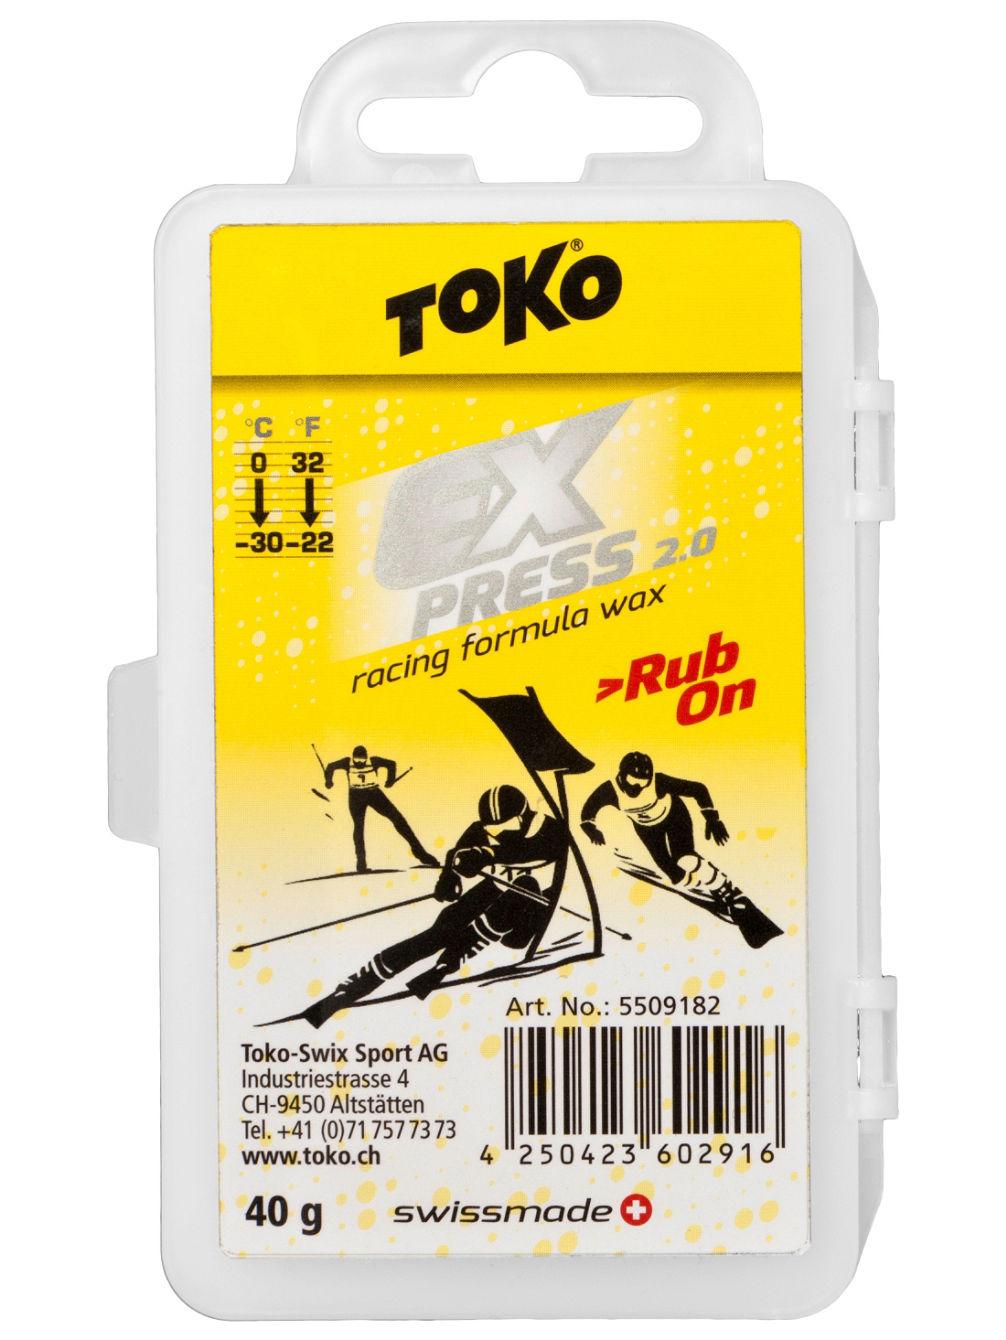 toko-express-racing-rub-on